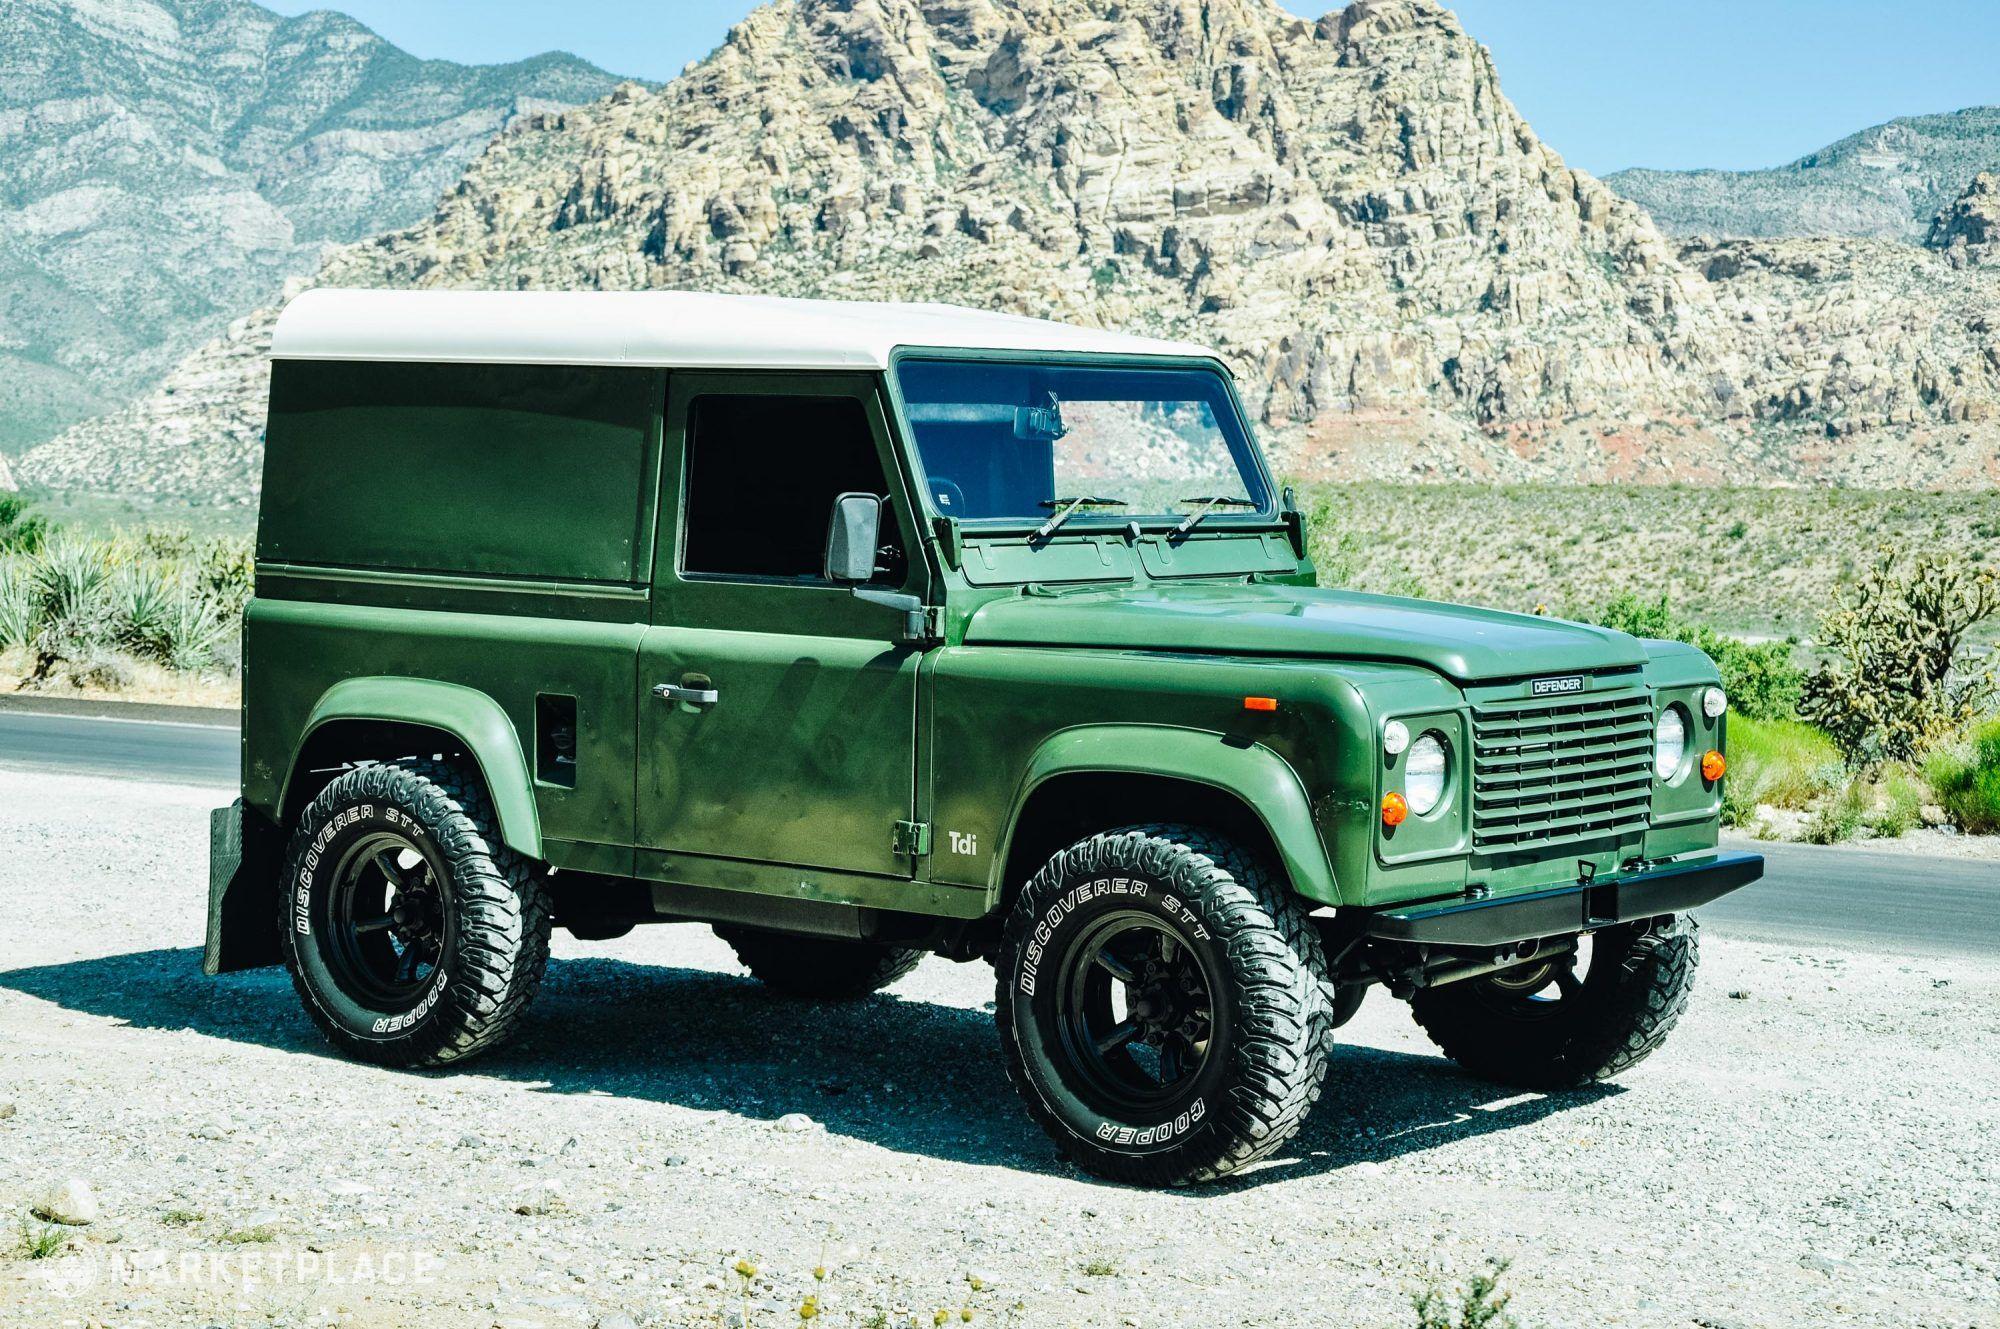 1990 Defender 90 200 Tdi Petrolicious Defender 90 Land Rover Defender Land Rover